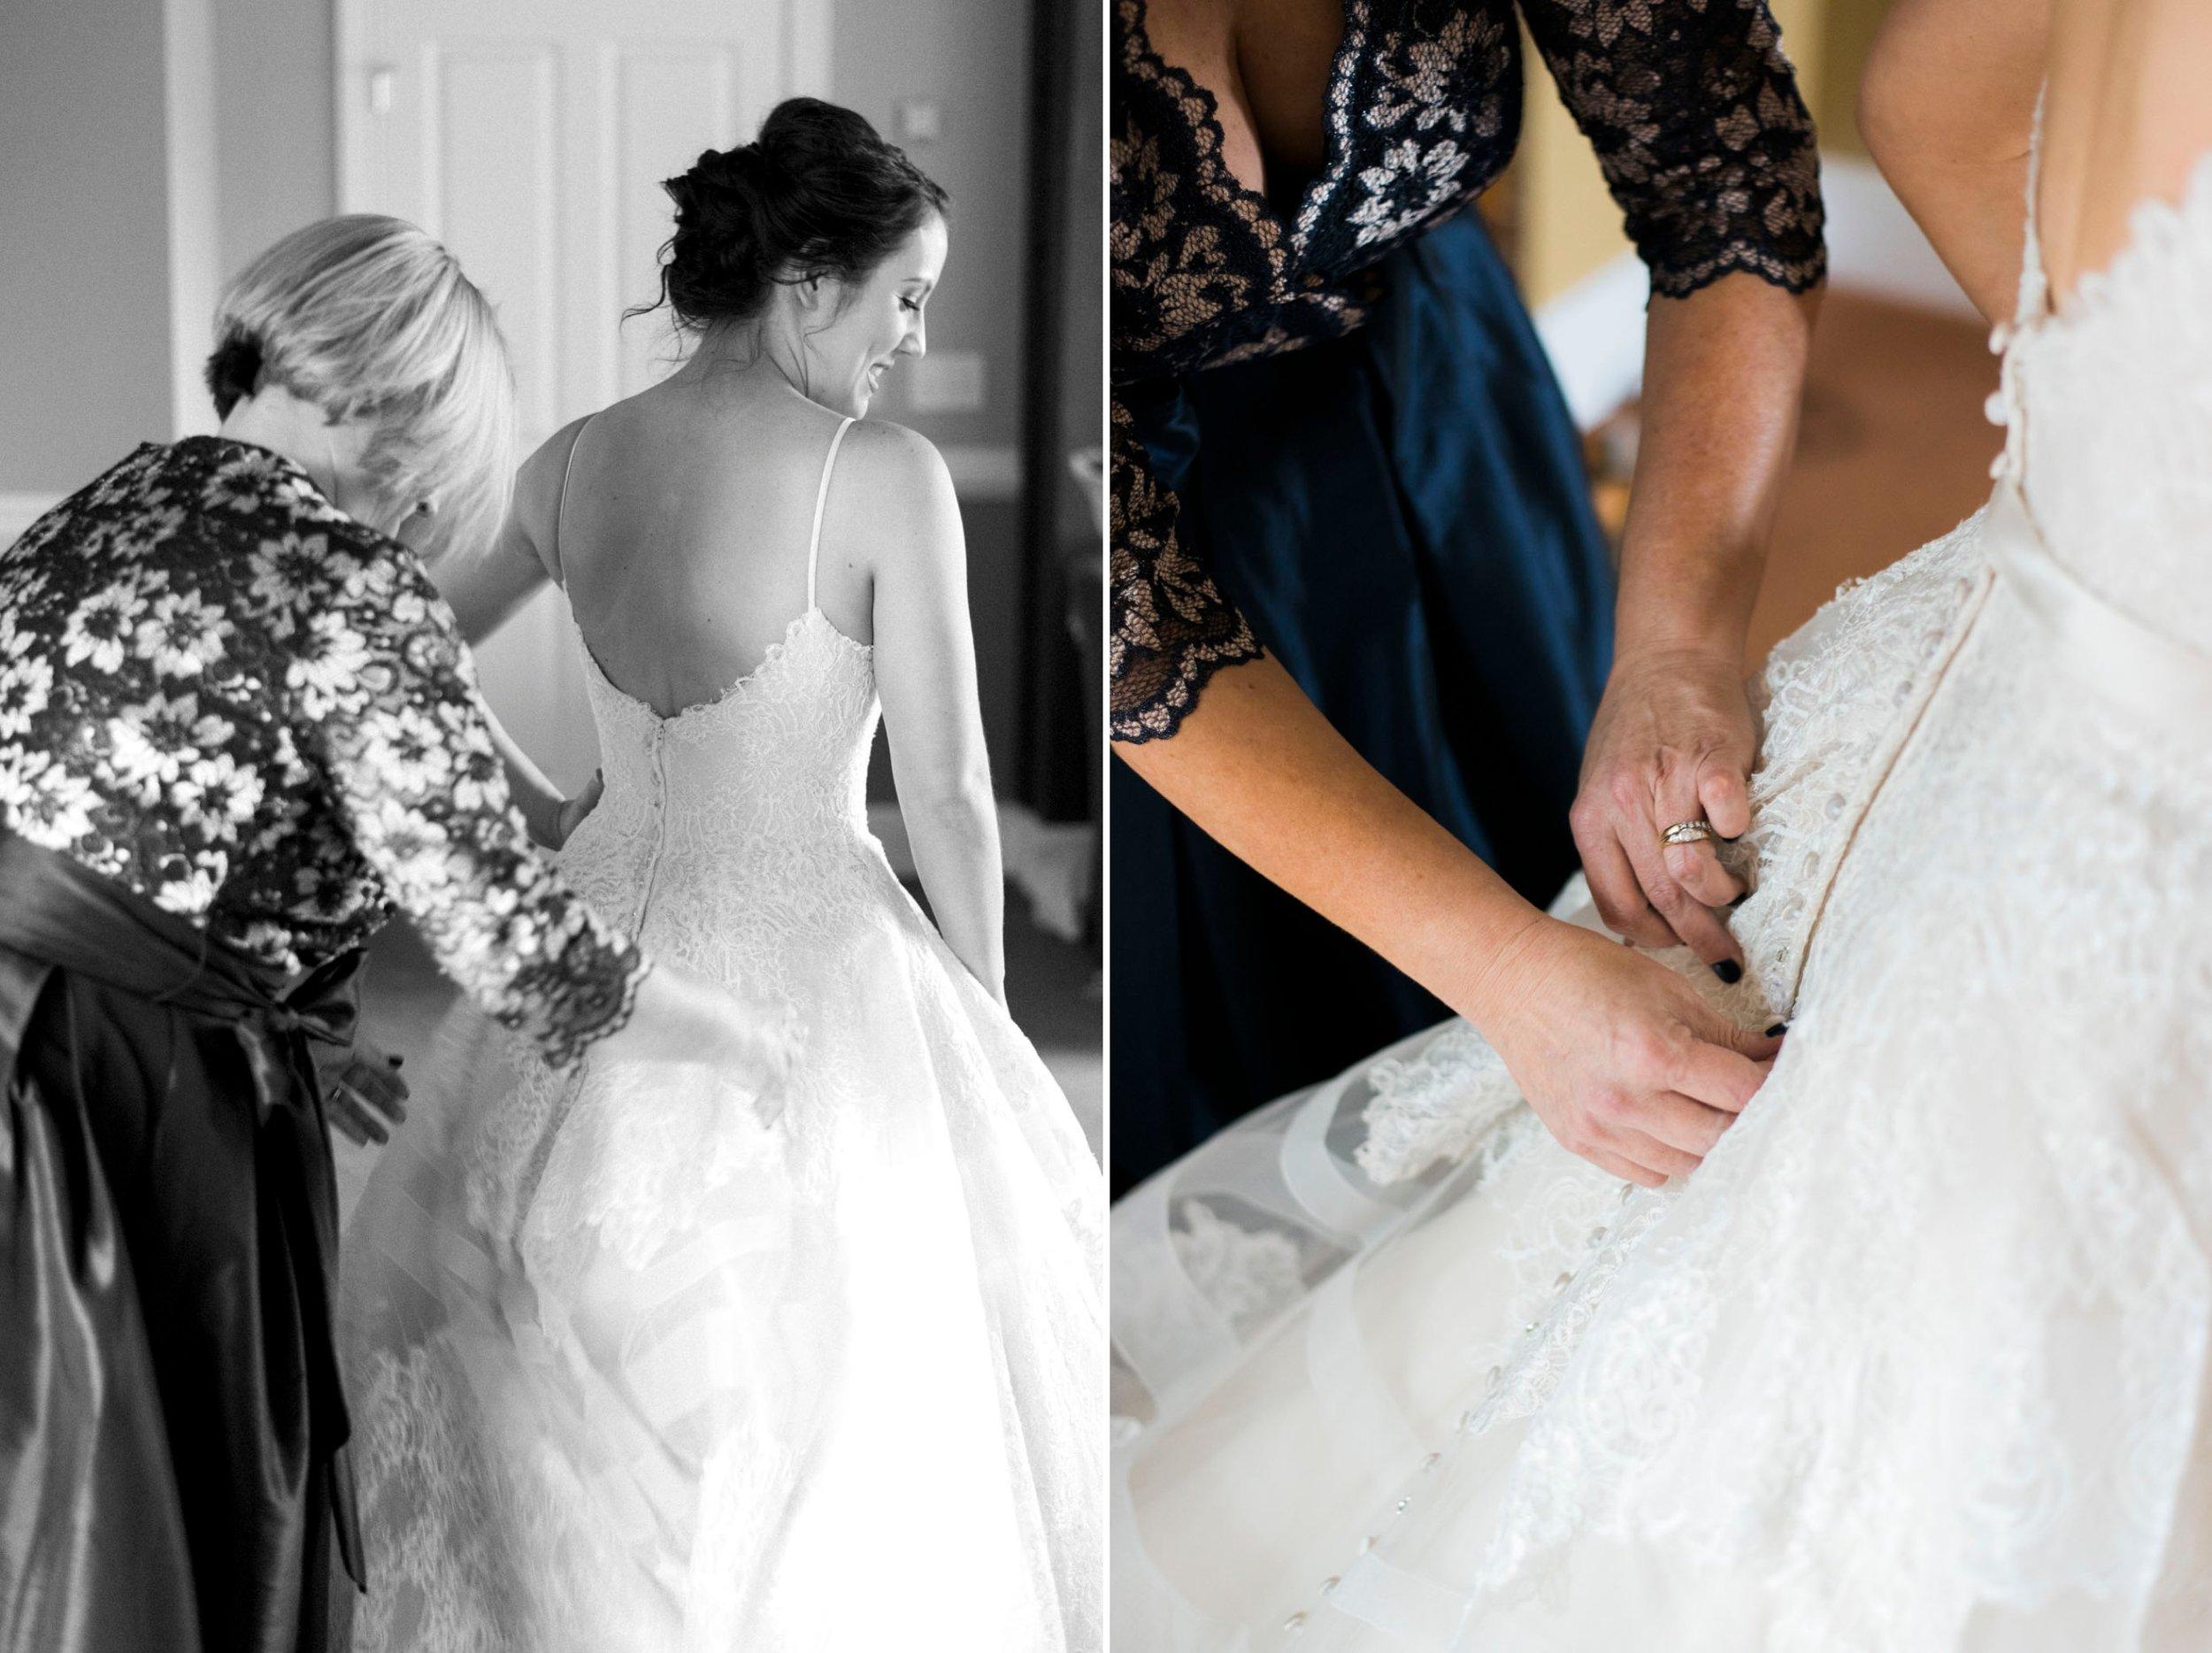 IrvineEstate_LexingtonVA_Wedding_FallWedding_VirginiaWeddingPhotographer 13.jpg